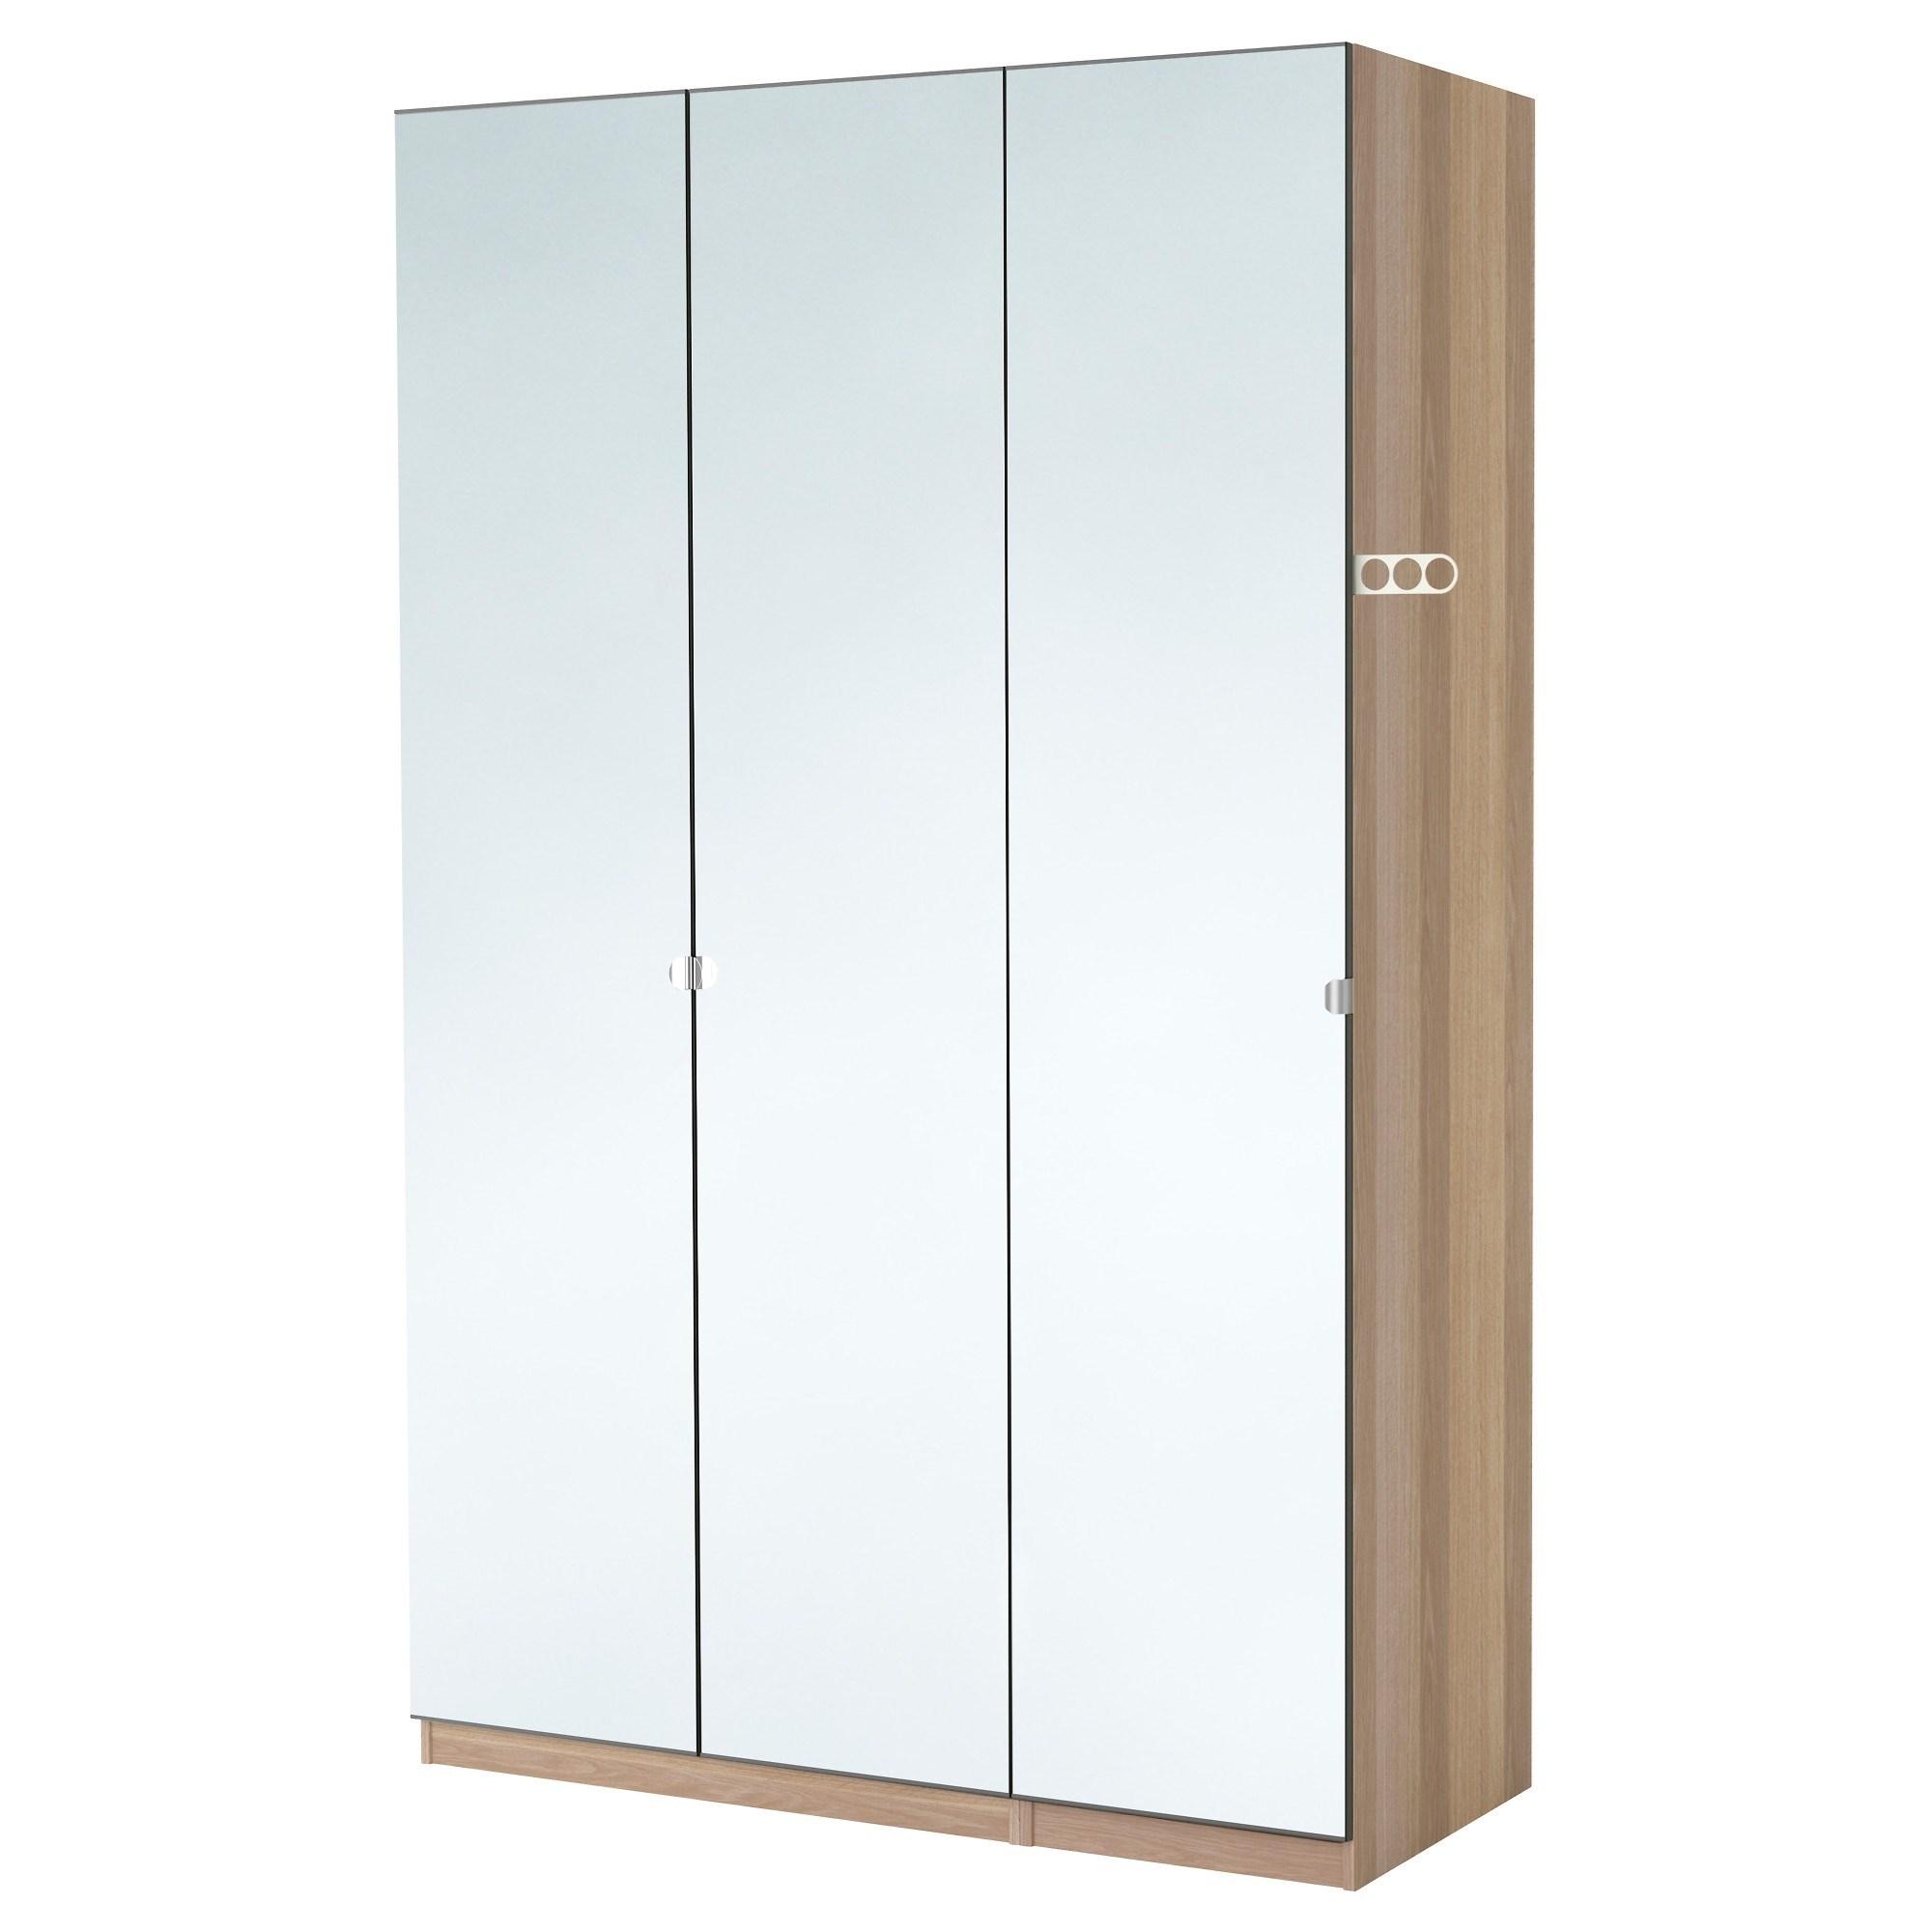 PAX/VIKEDAL wardrobe white stained oak effect/mirror